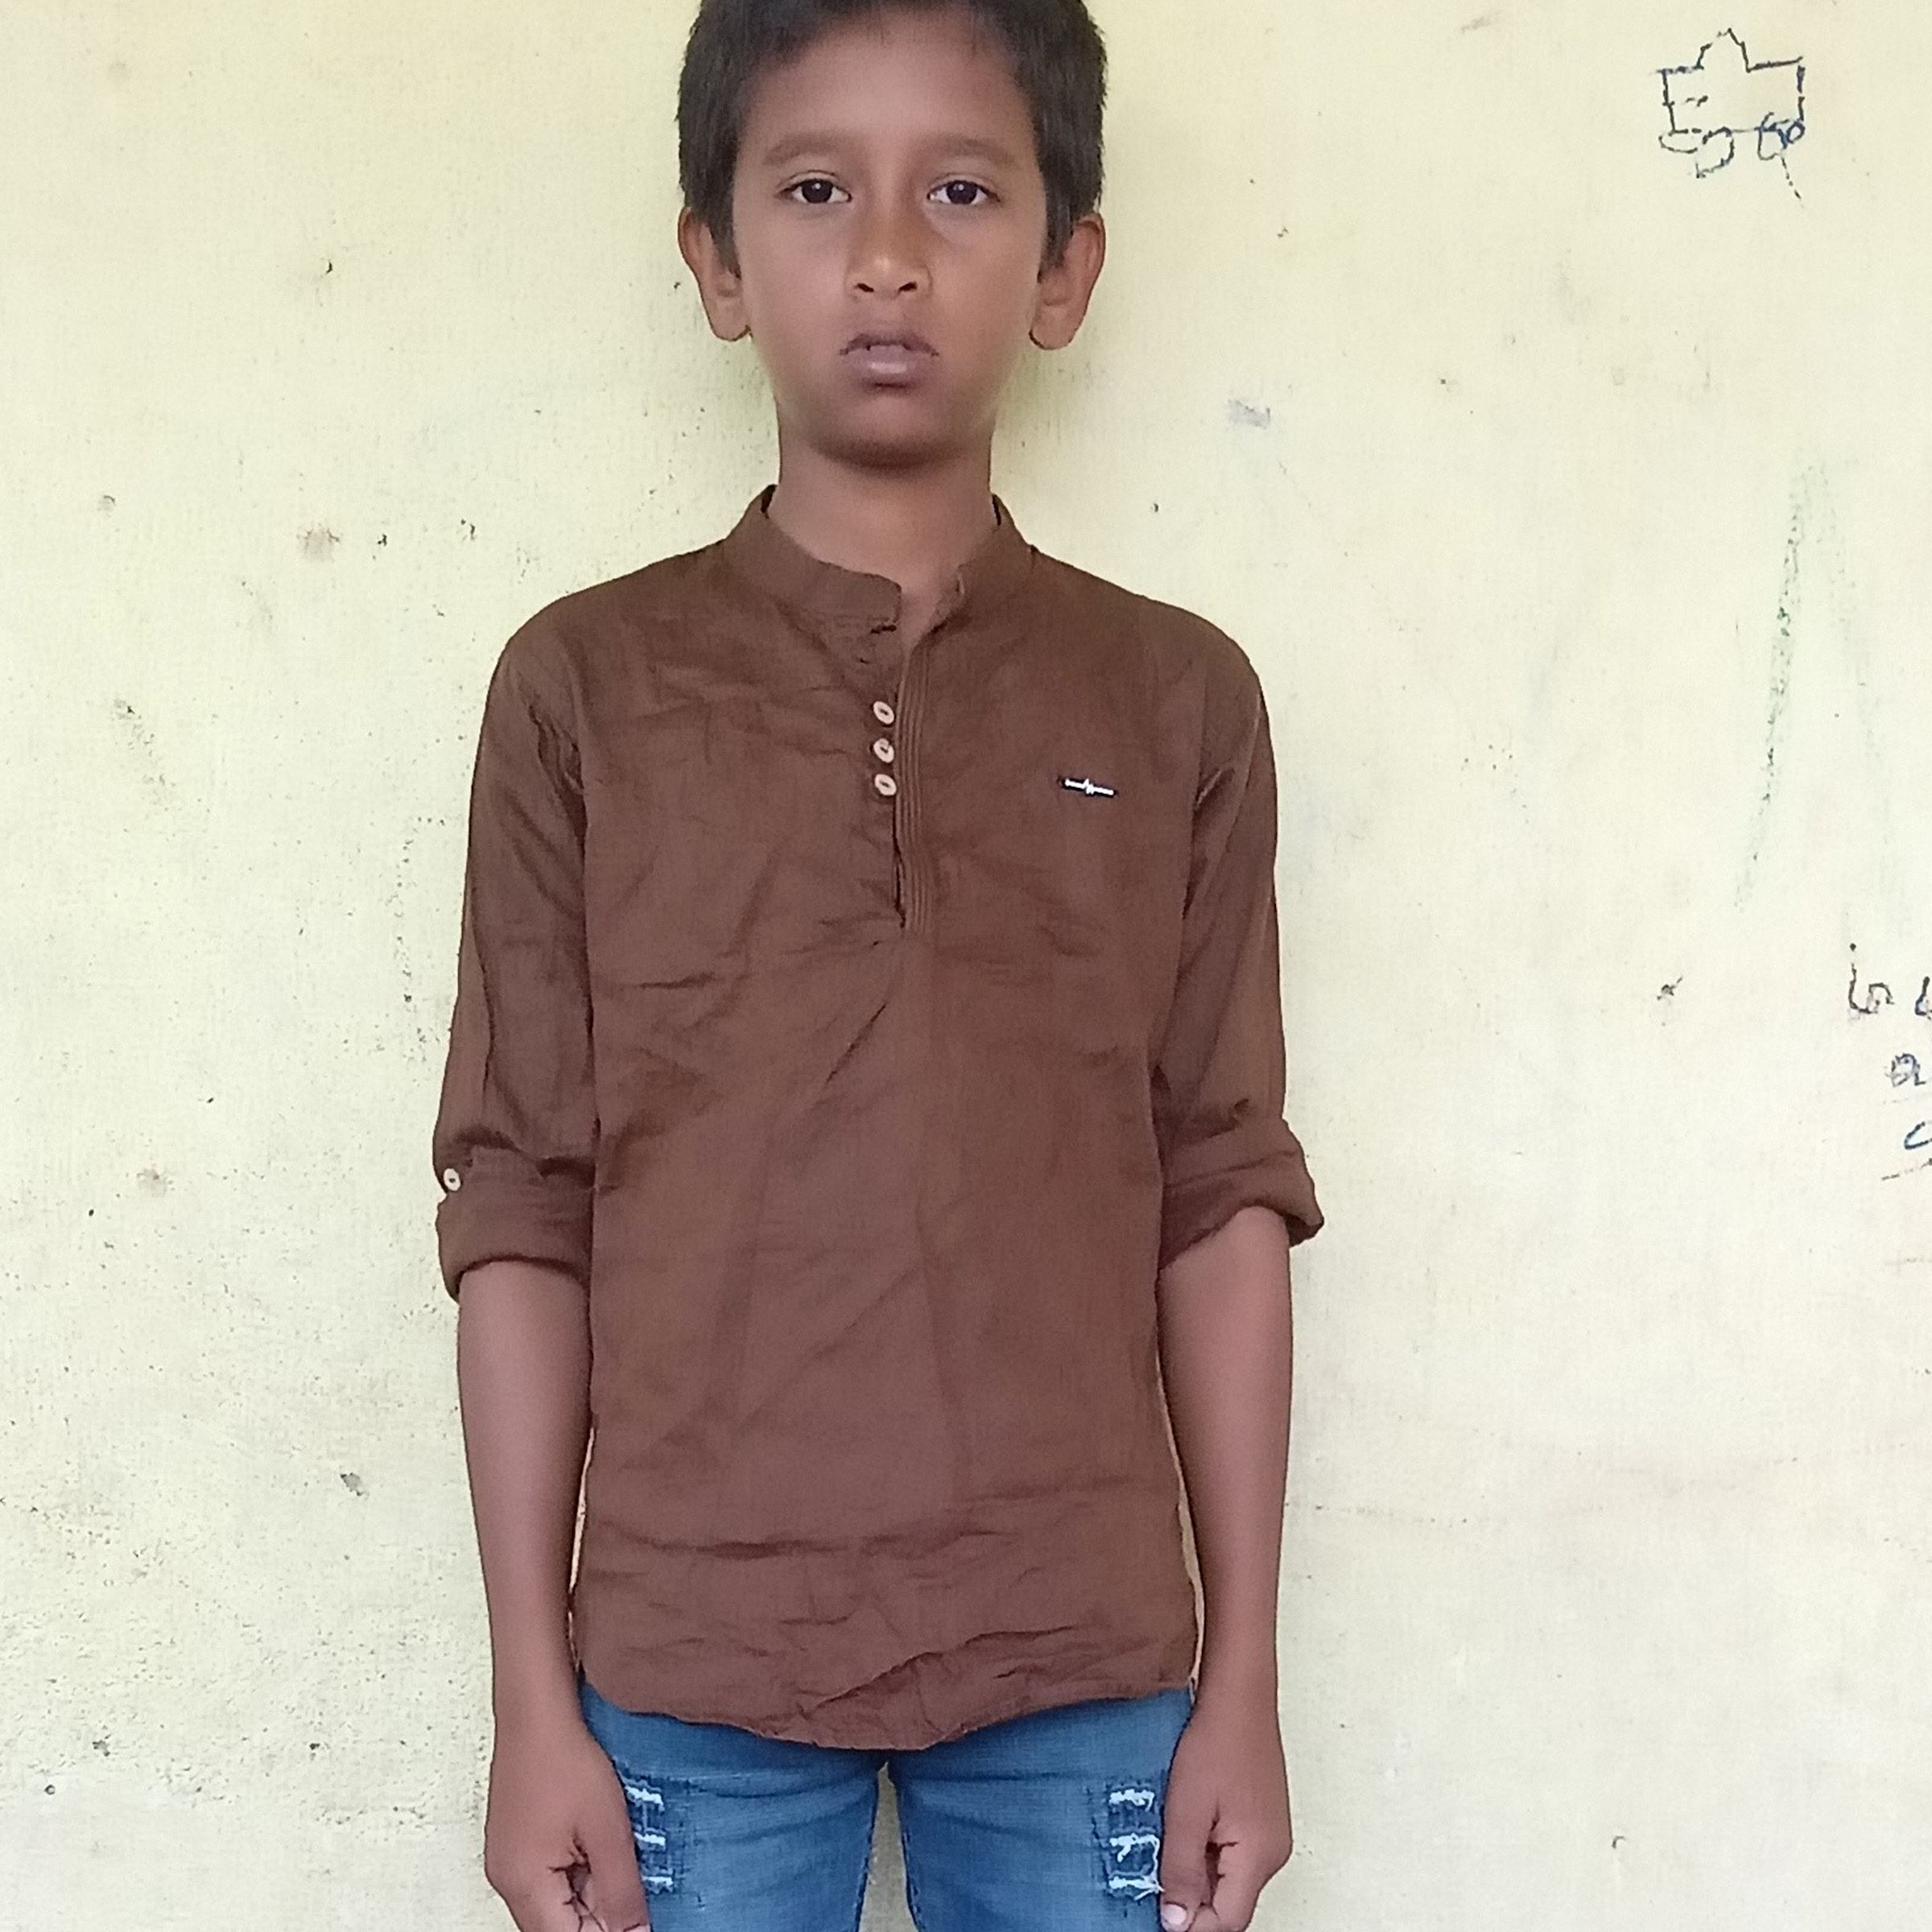 Human Appeal Orphan - Moahmed Akmal